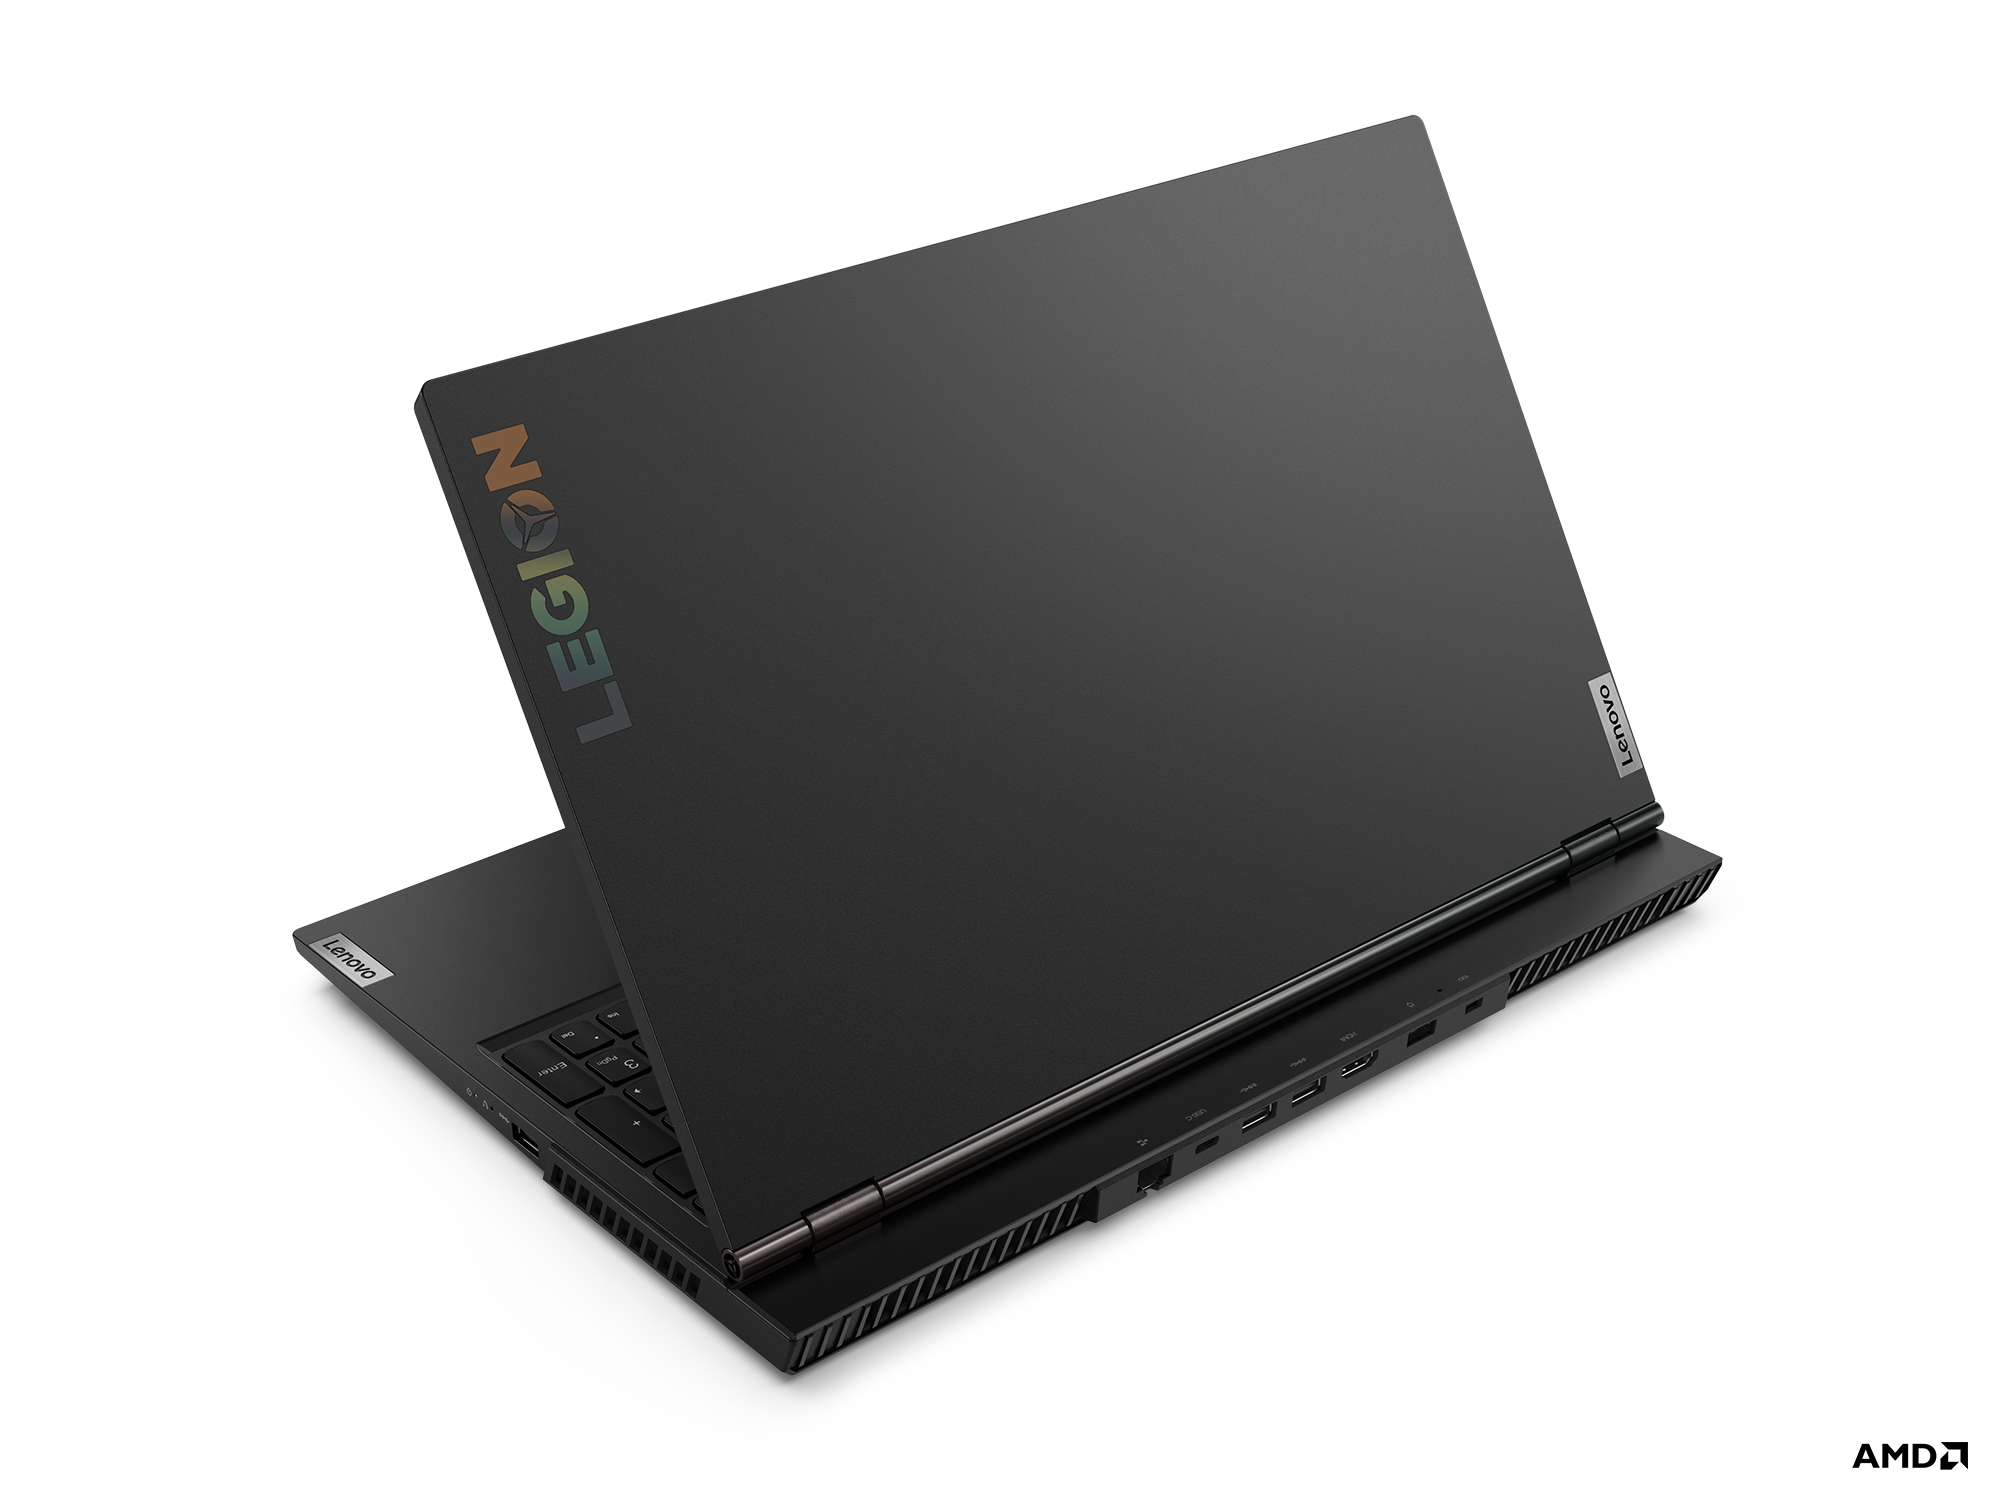 Lenovo brings AMD Ryzen options to its Legion PCs 12